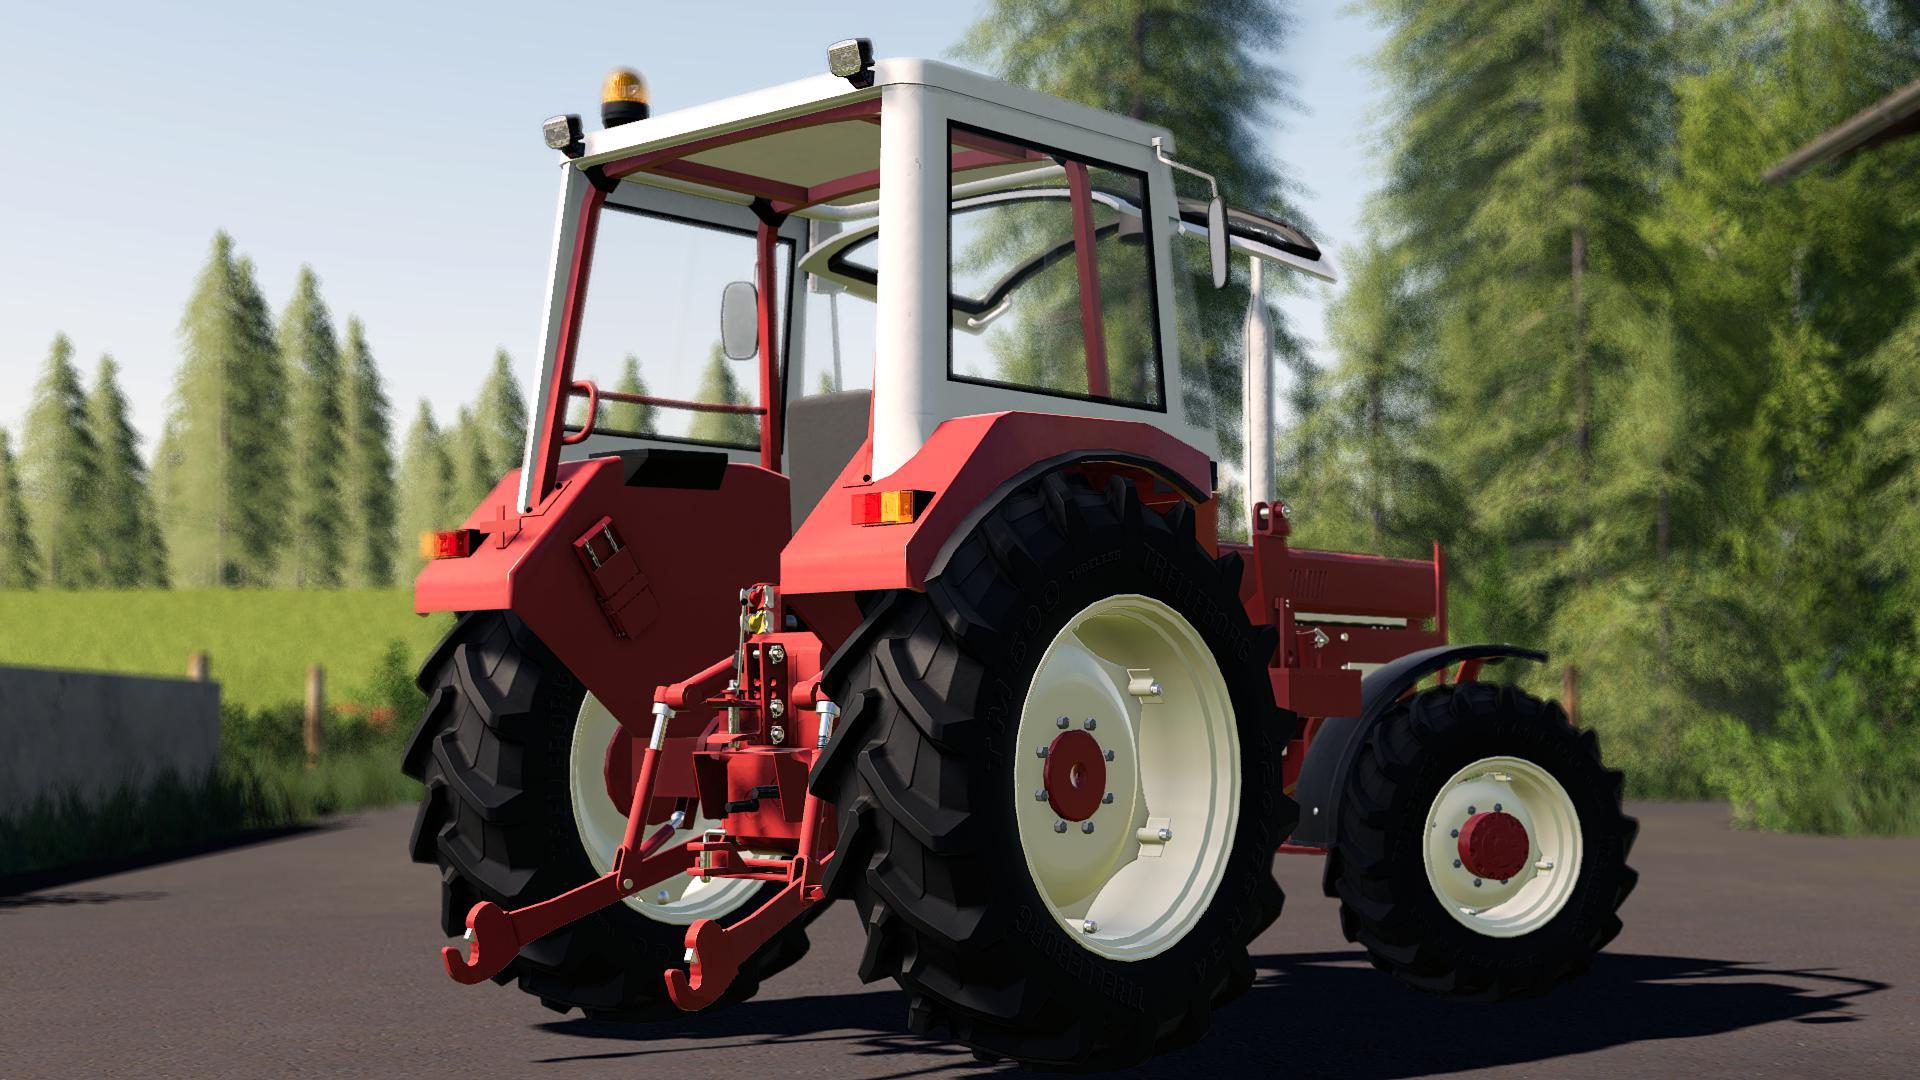 IHC 554-644 v1.0.0.0 FS19 | Landwirtschafts Simulator 19